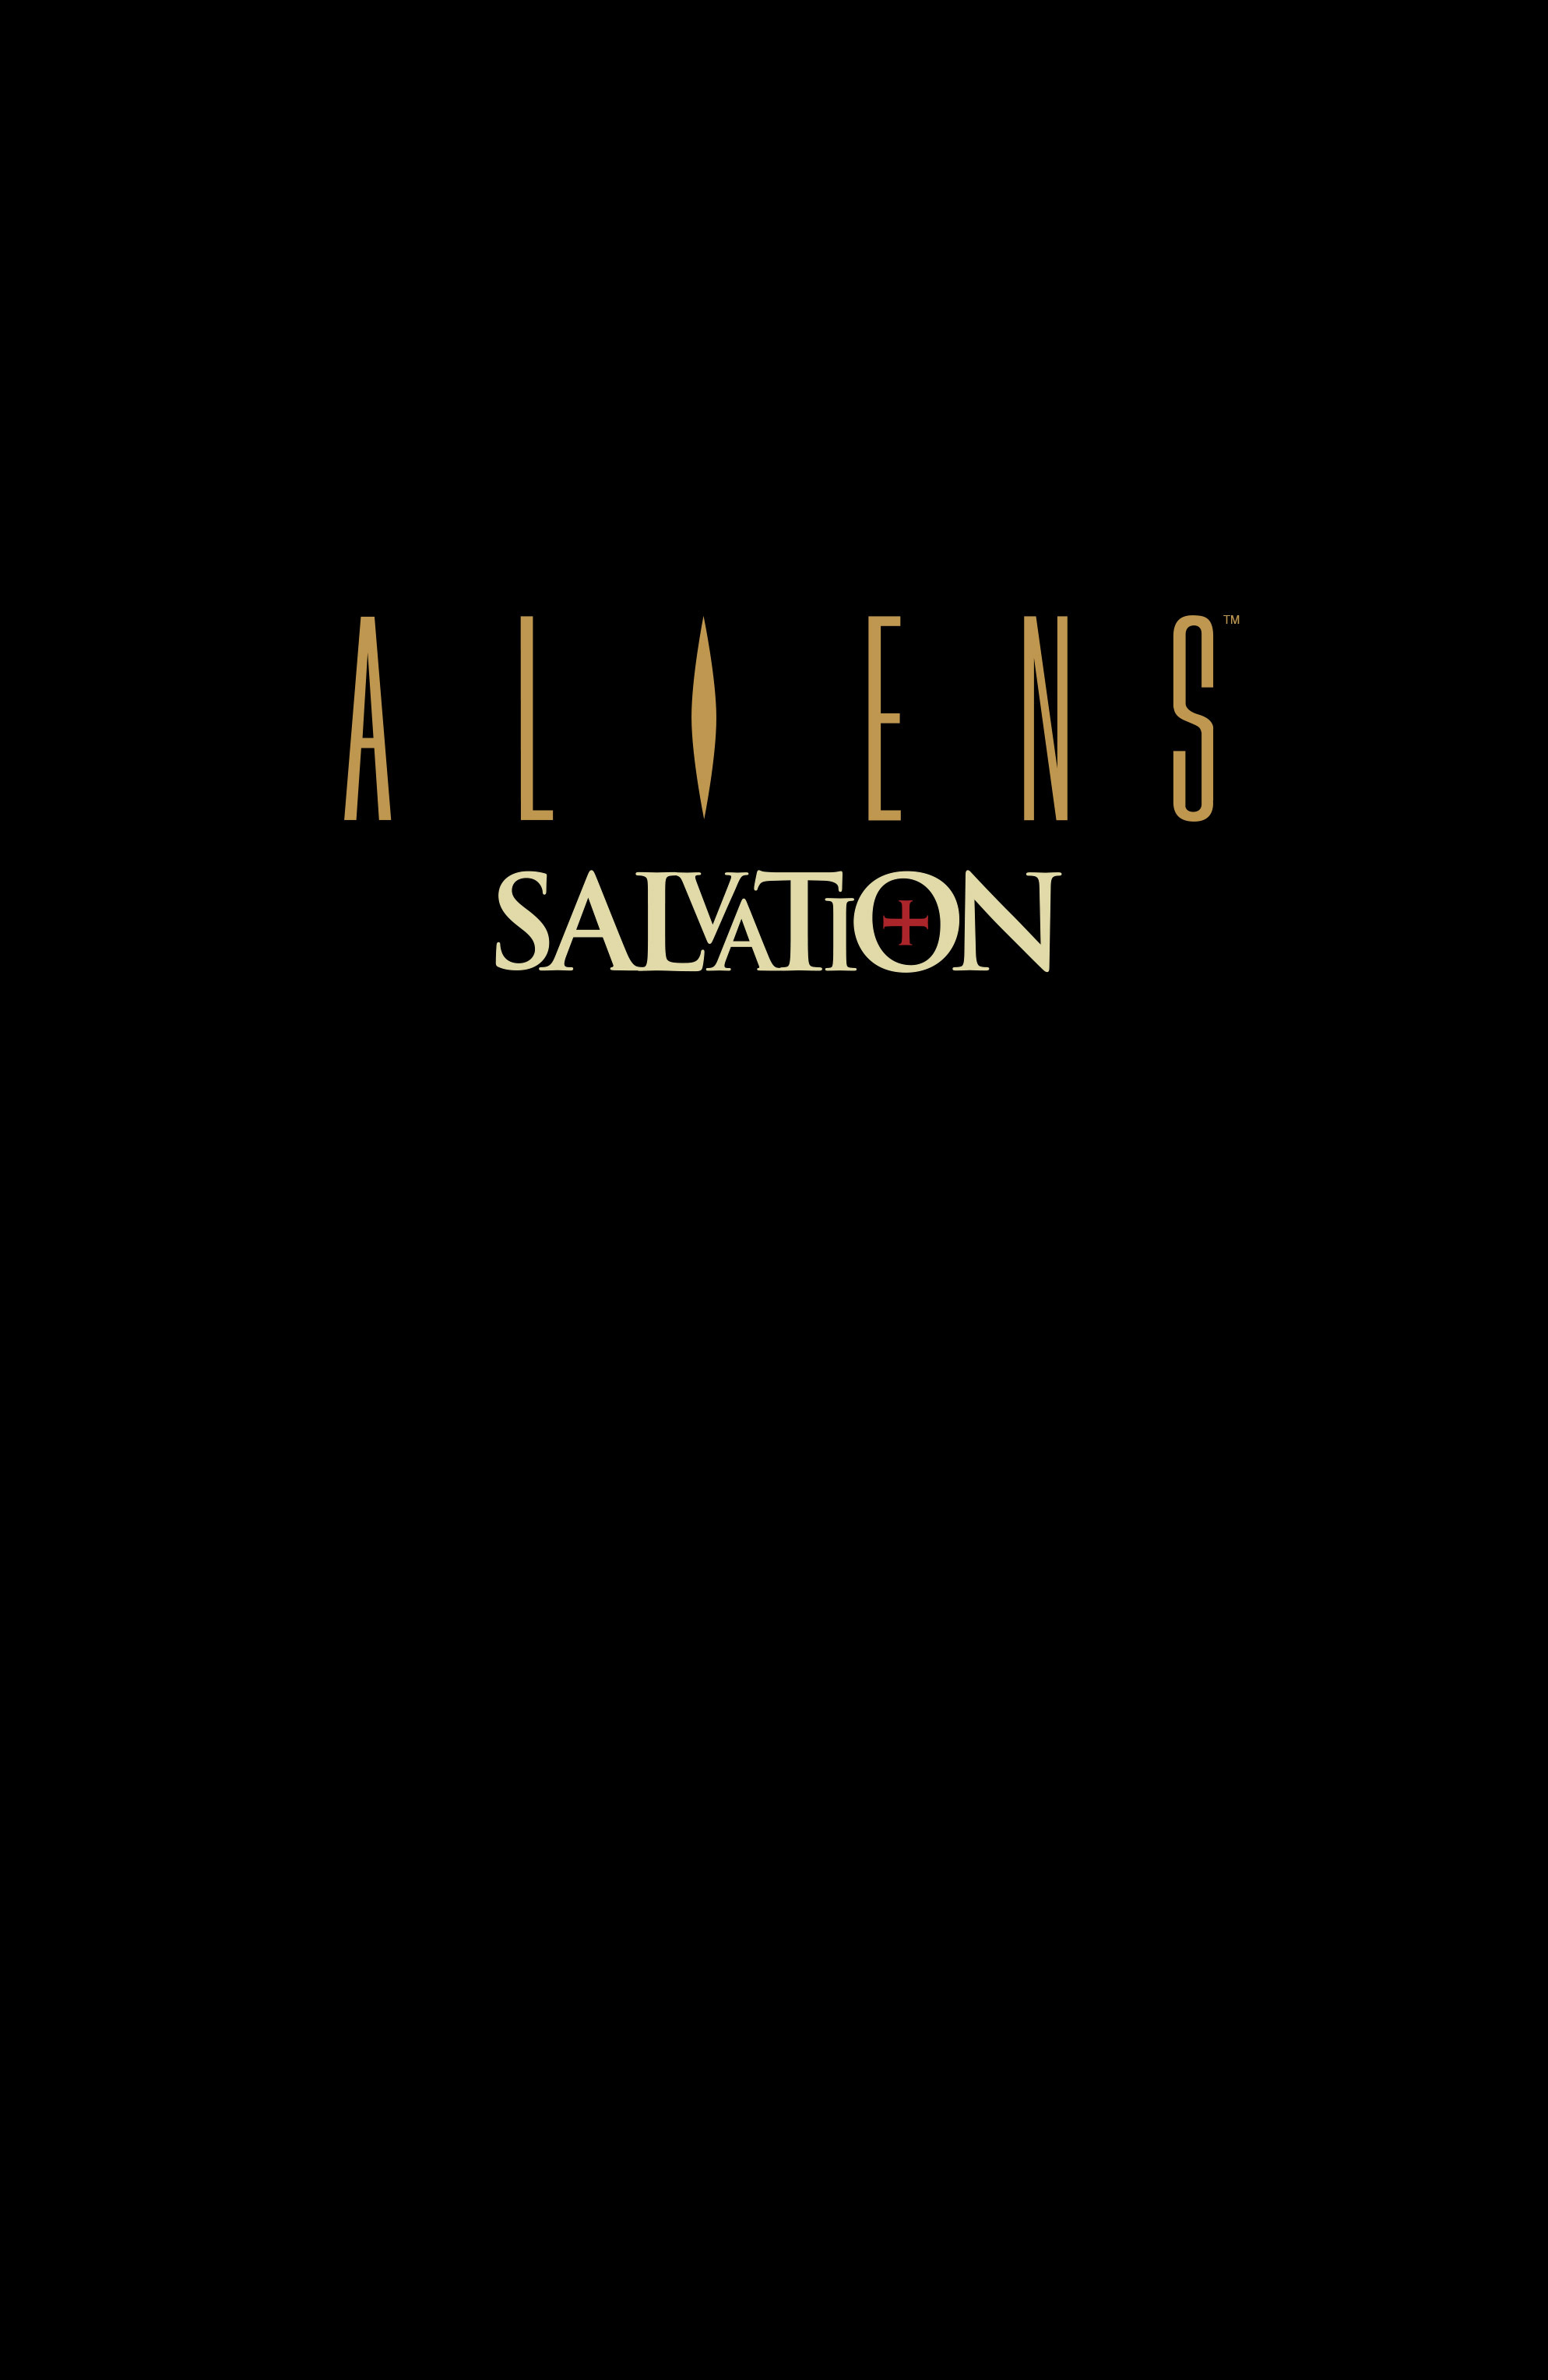 Read online Aliens: Salvation comic -  Issue # TPB - 3